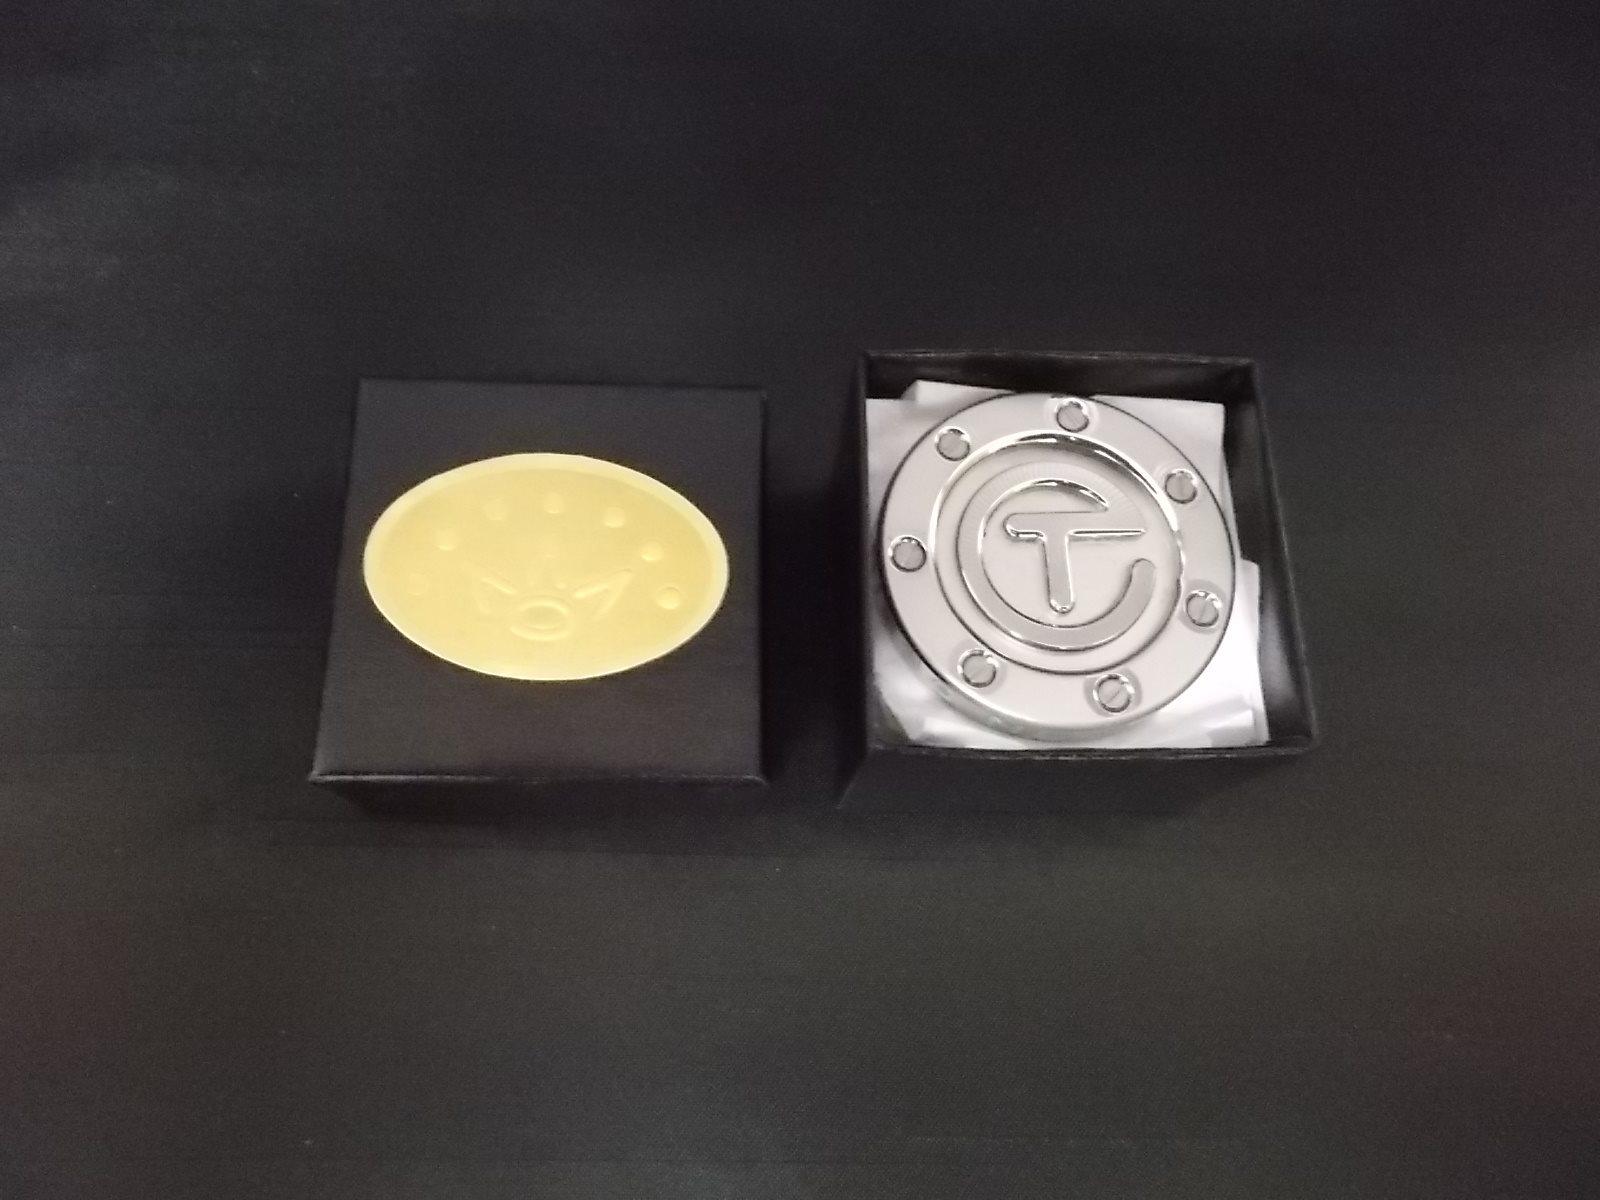 ScottyCameron gallery Limited Coin Ball Marker Circle T Tiffany Blue スコッティキャメロン ギャラリー限定 サークルT コインボールマーカー